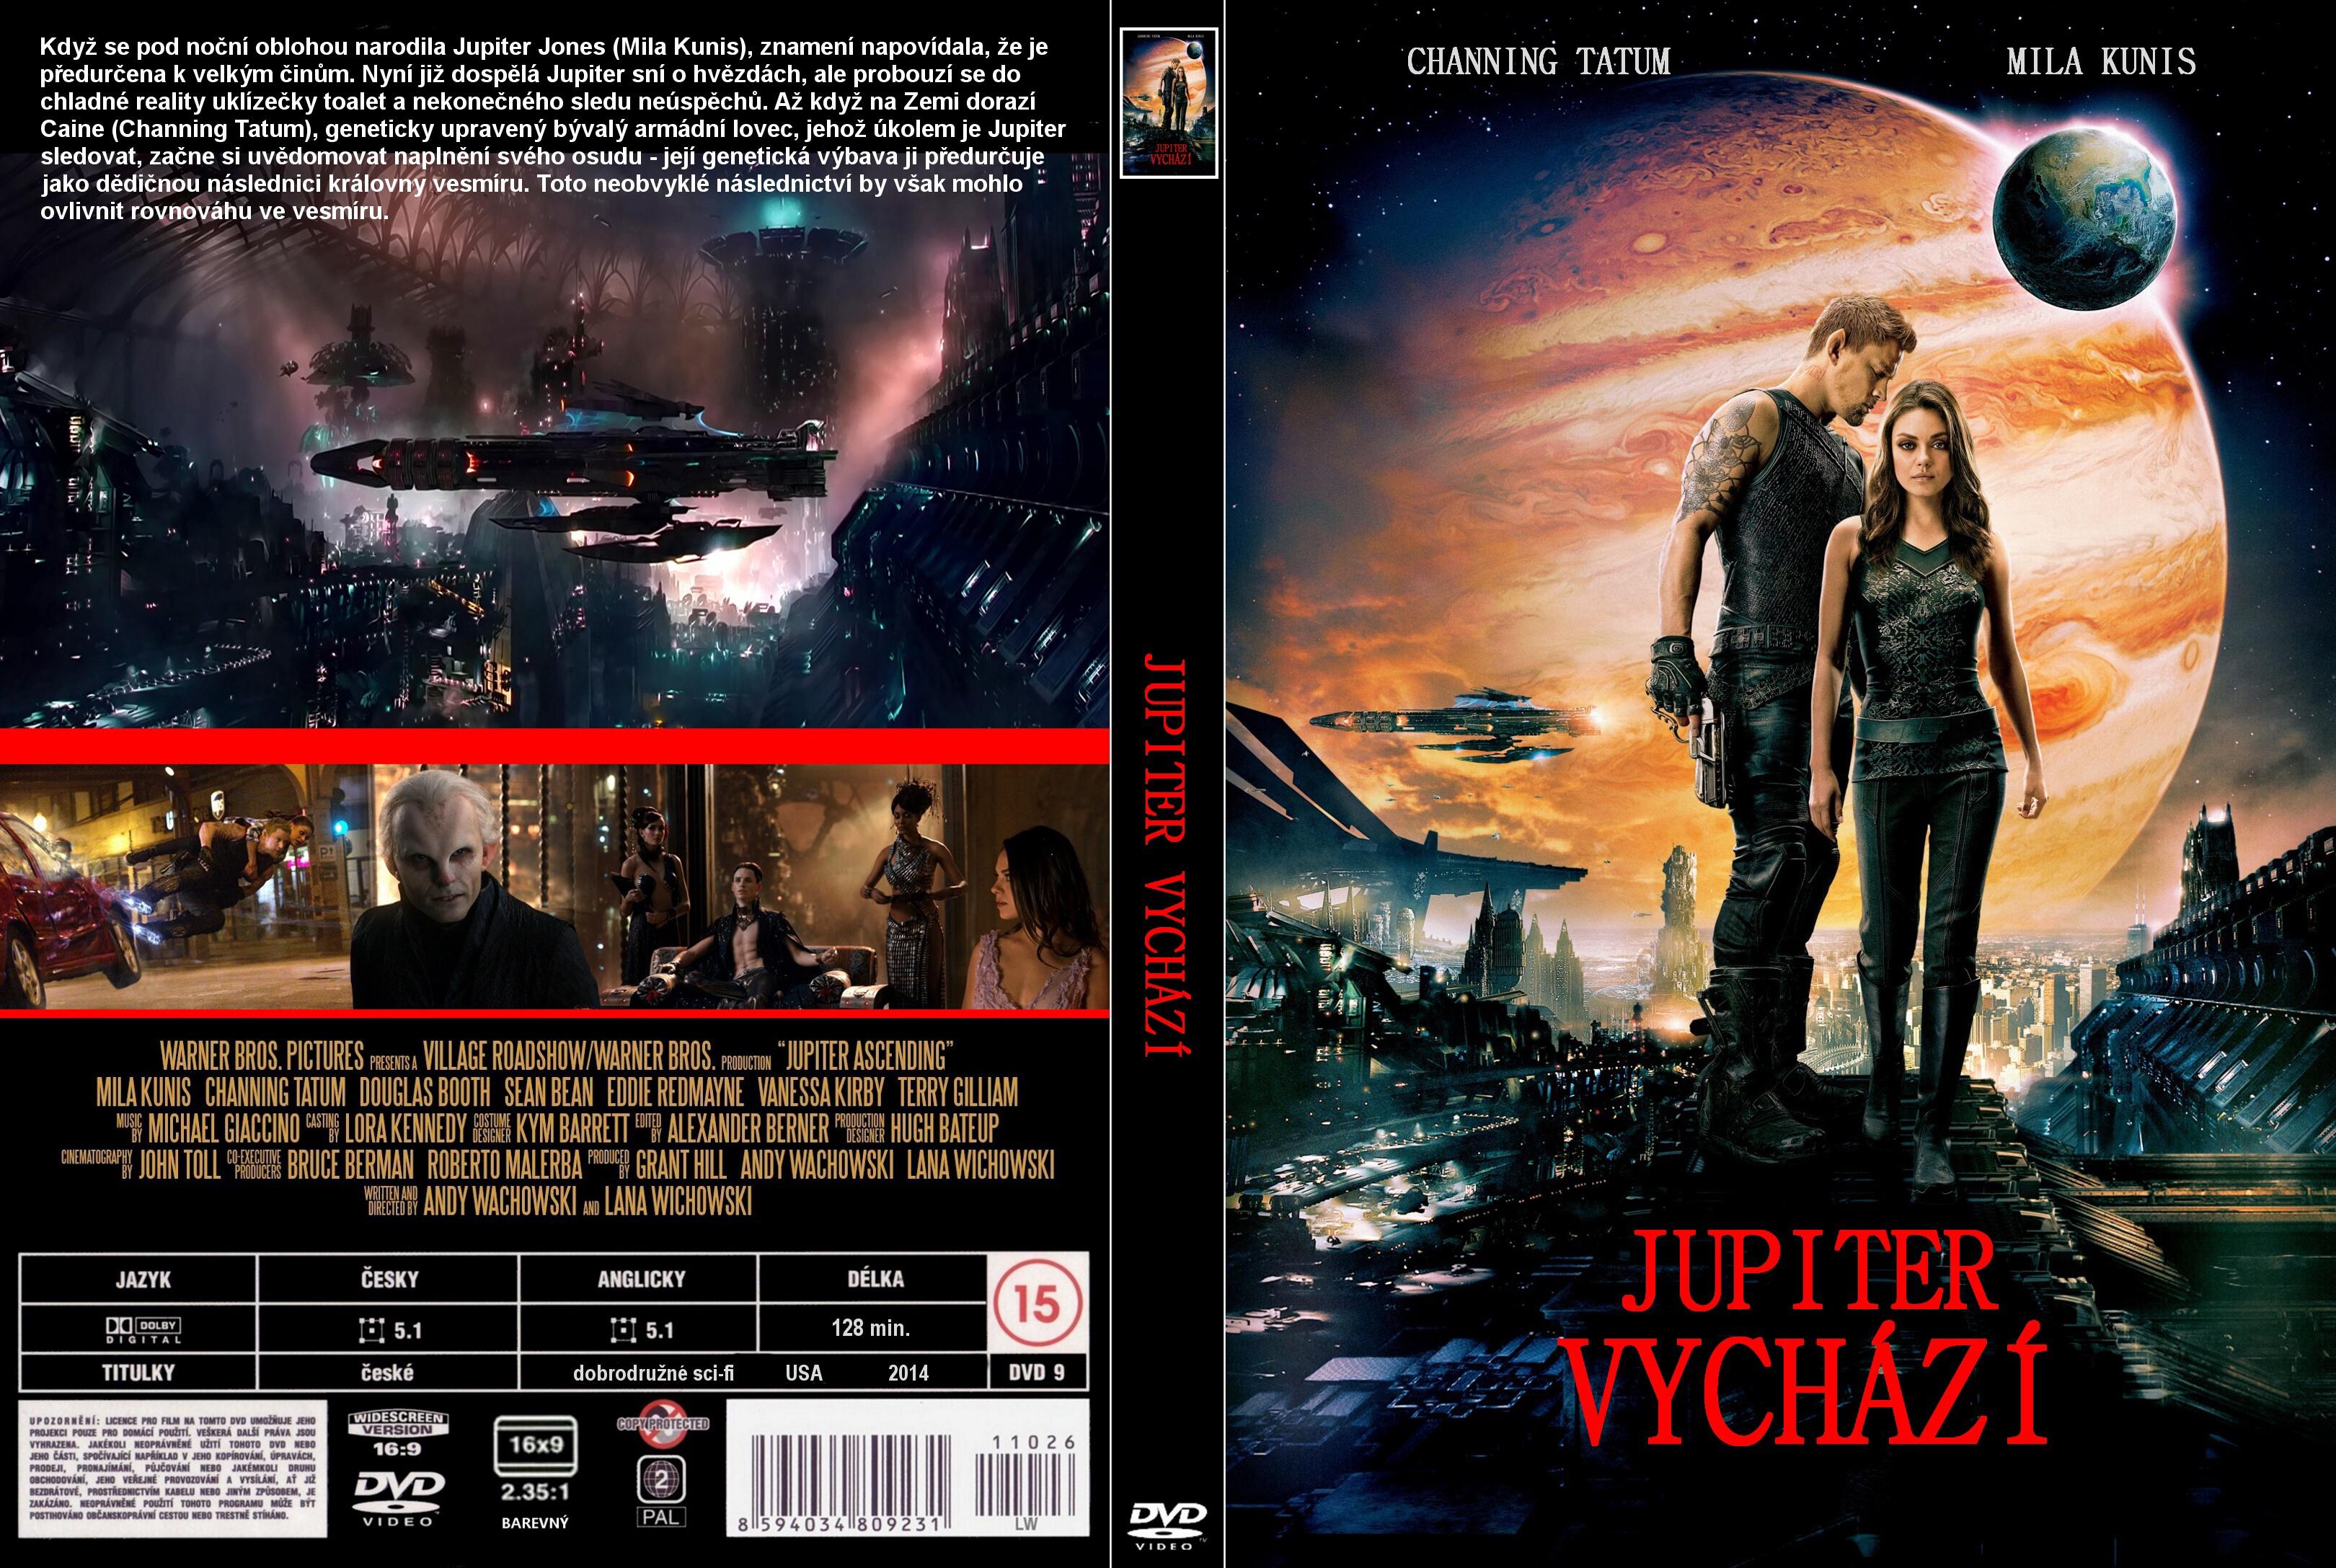 Covers Box Sk Jupiter Ascending 2015 High Quality Dvd Blueray Movie